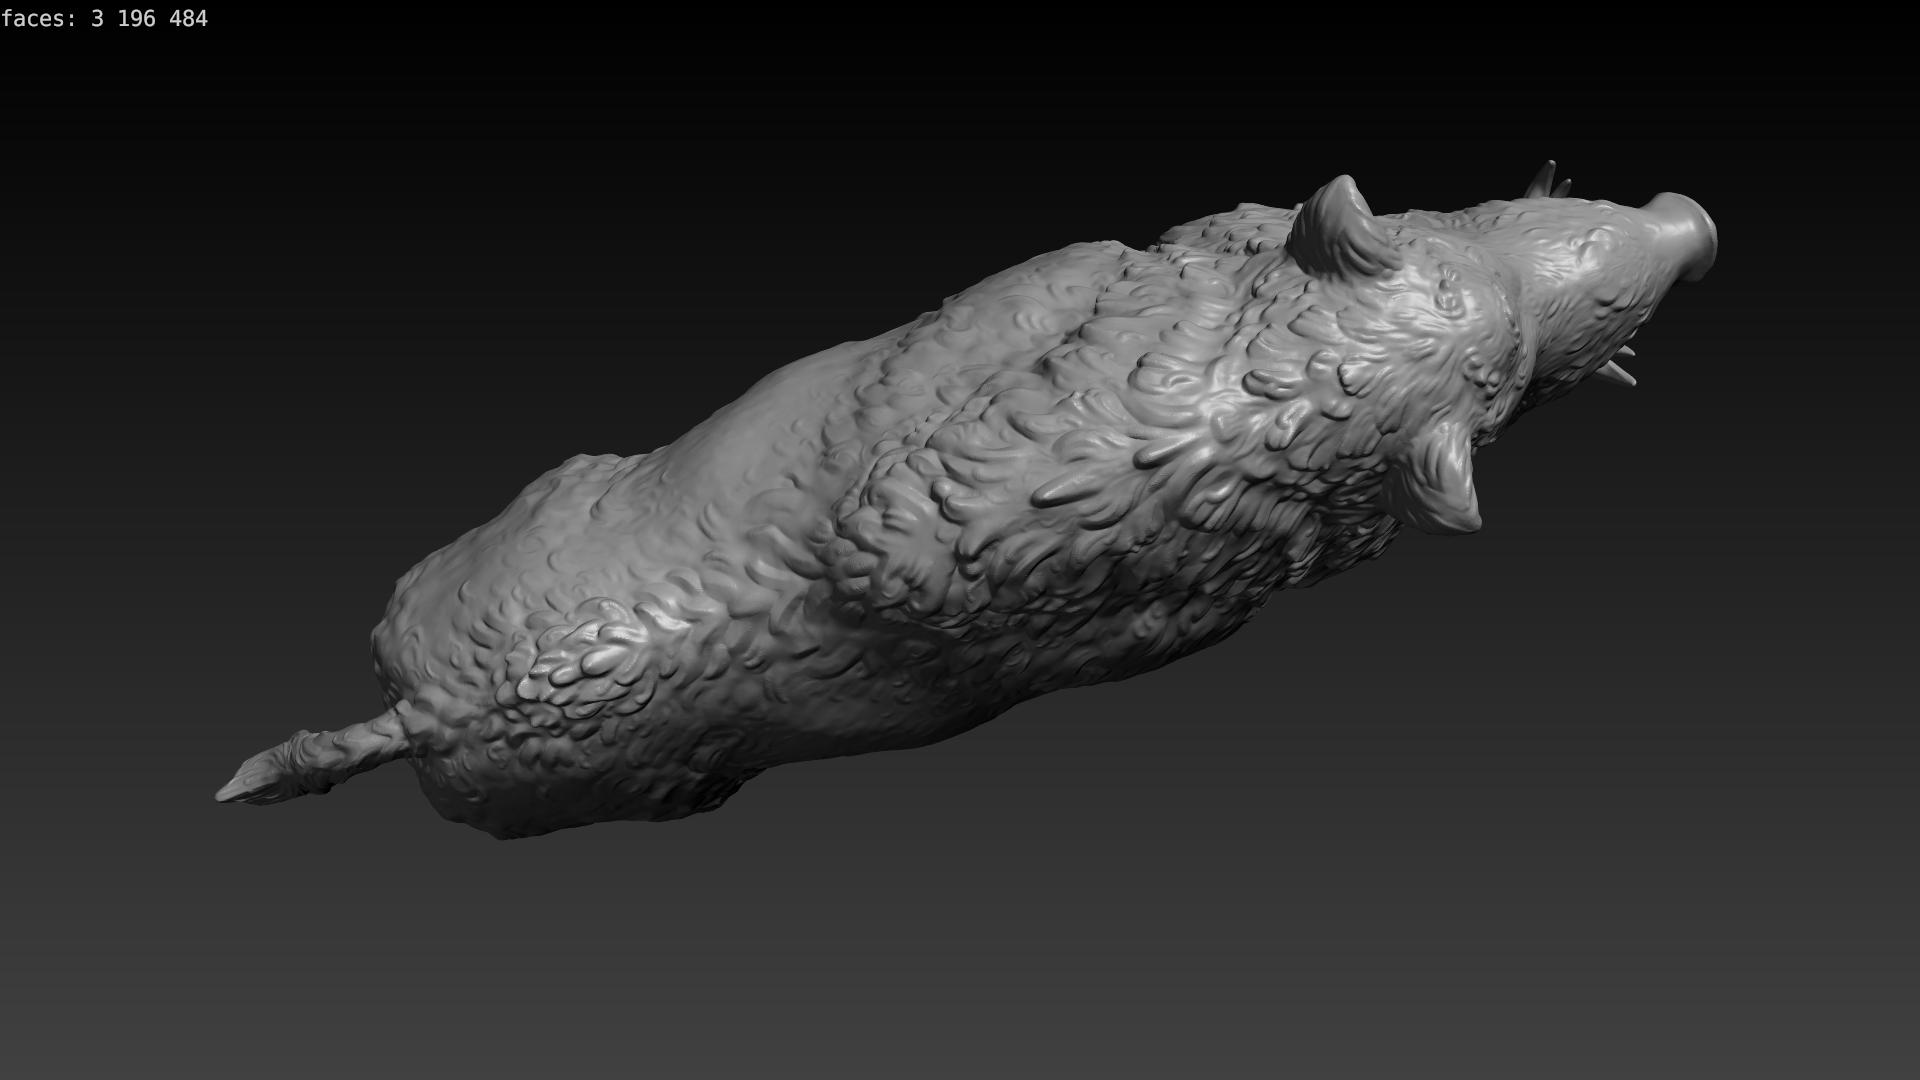 boar-07.png Download STL file Boar • 3D printable design, Skazok